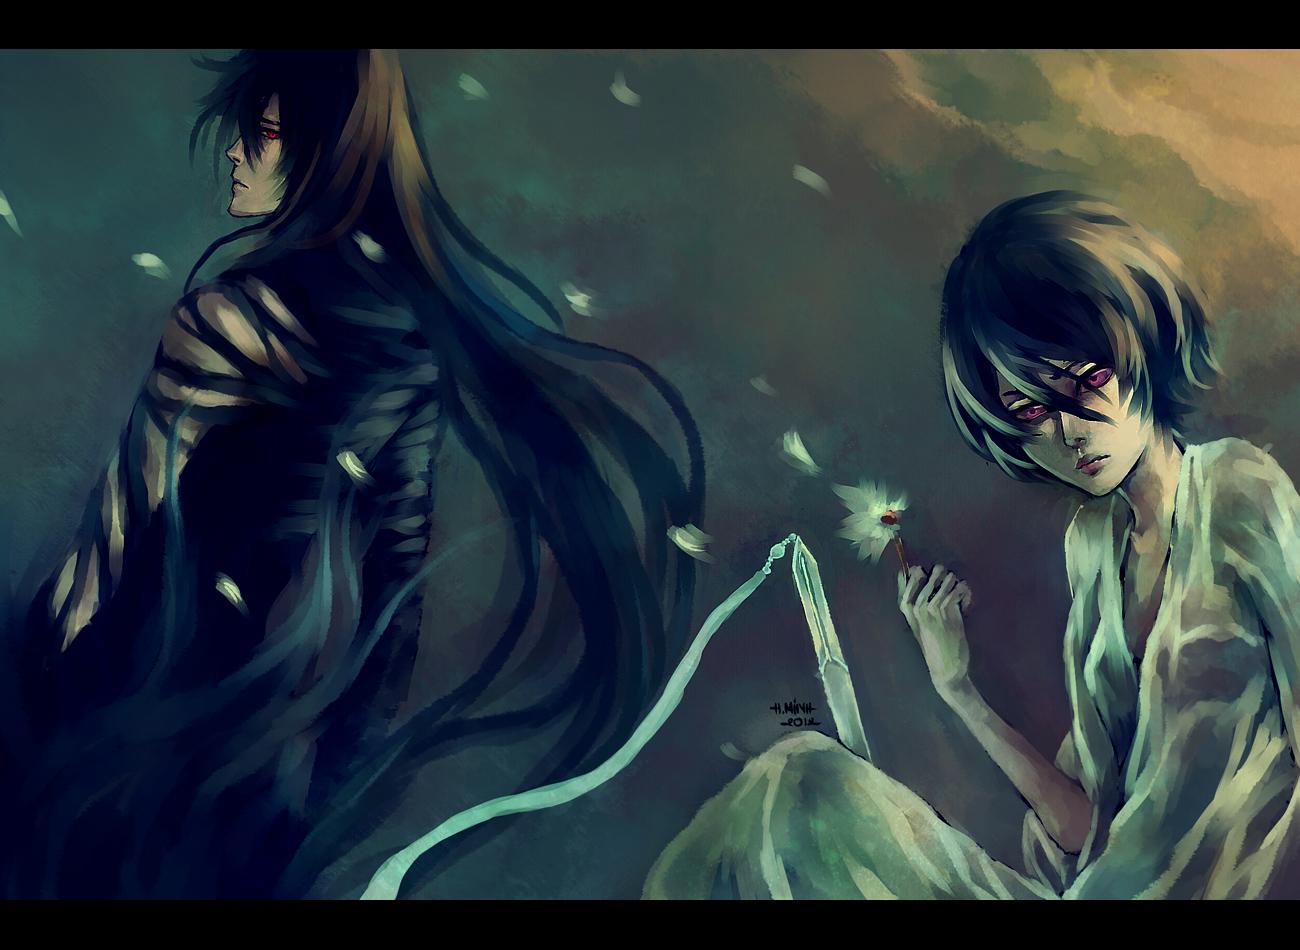 Dark rukia vs ichigo